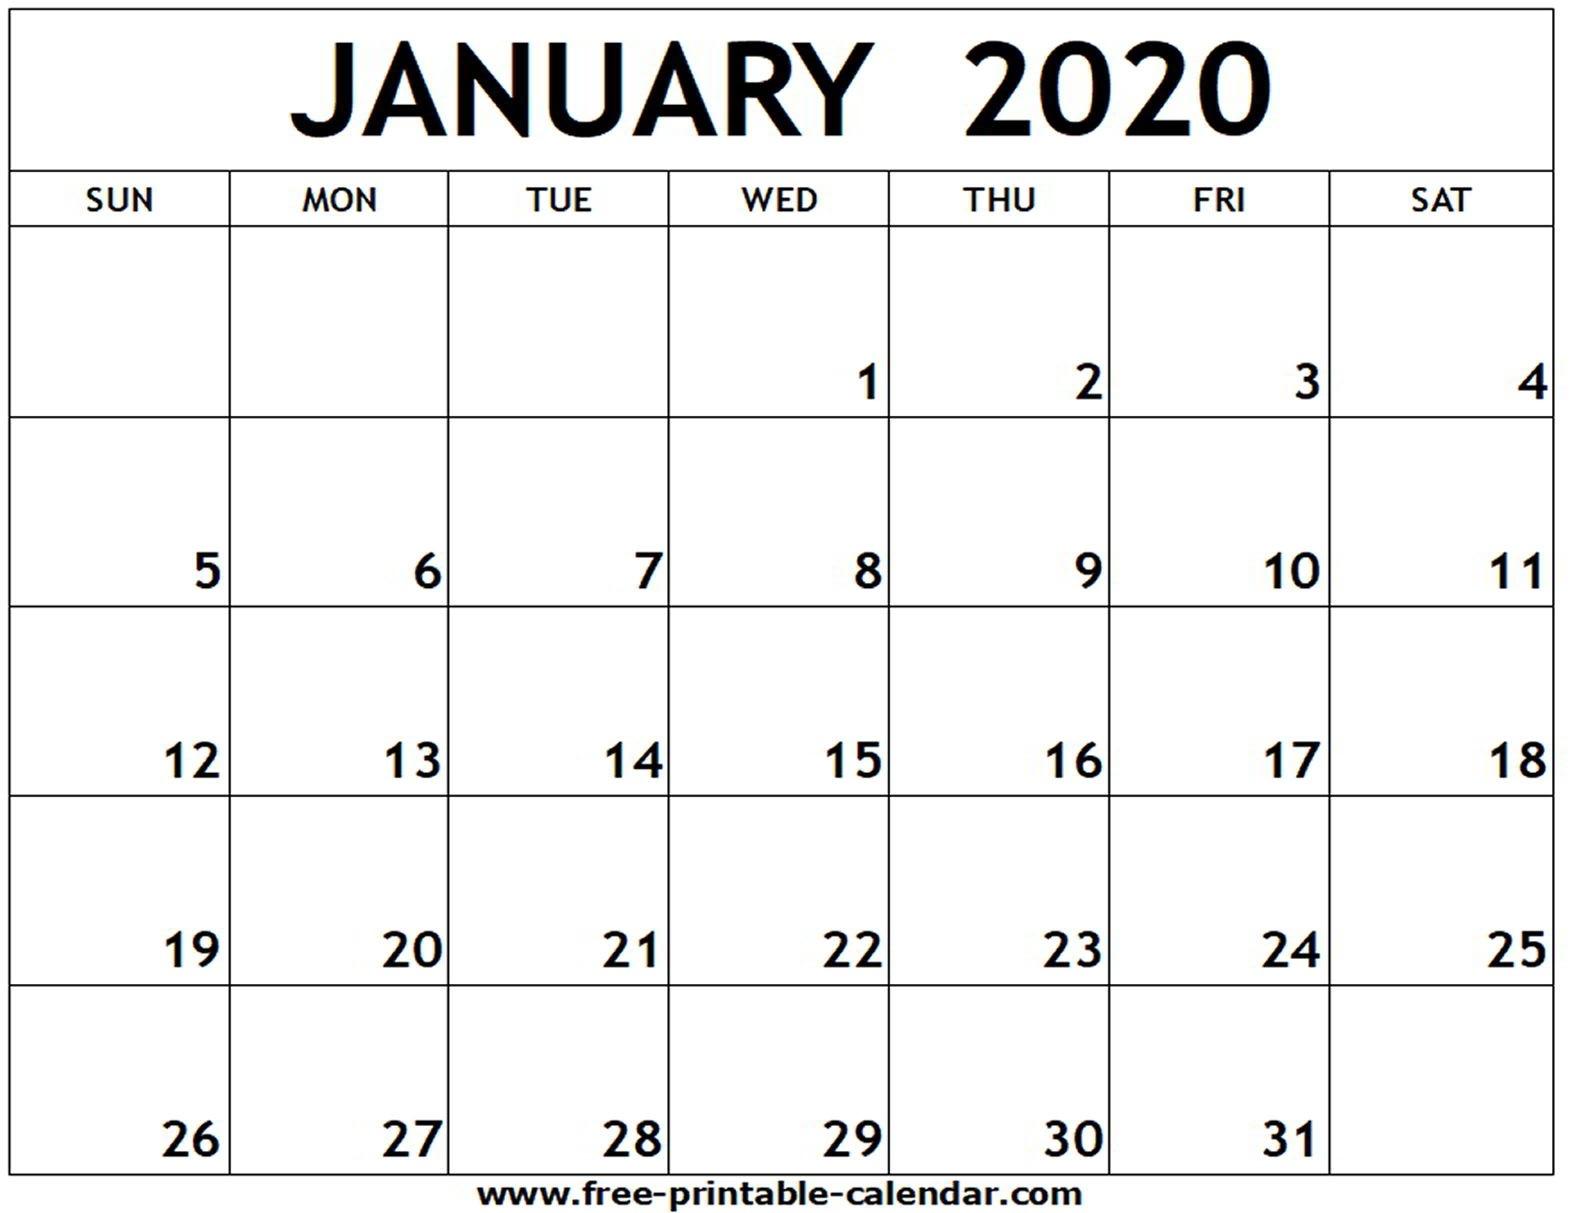 January 2020 Printable Calendar - Free-Printable-Calendar-January 2020 Calendar Canada